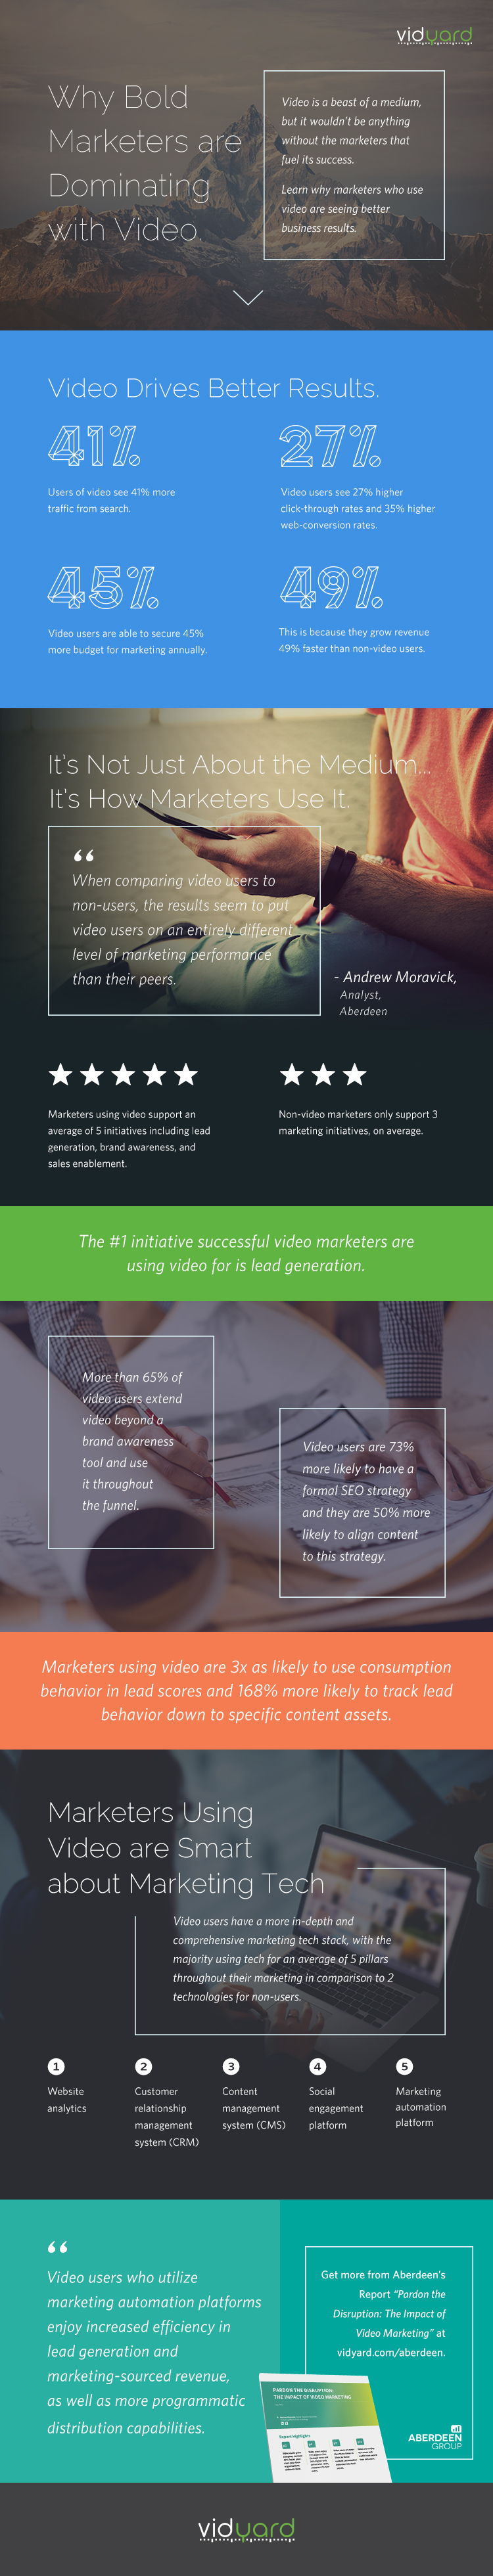 Aberdeen Video Marketing Infographic